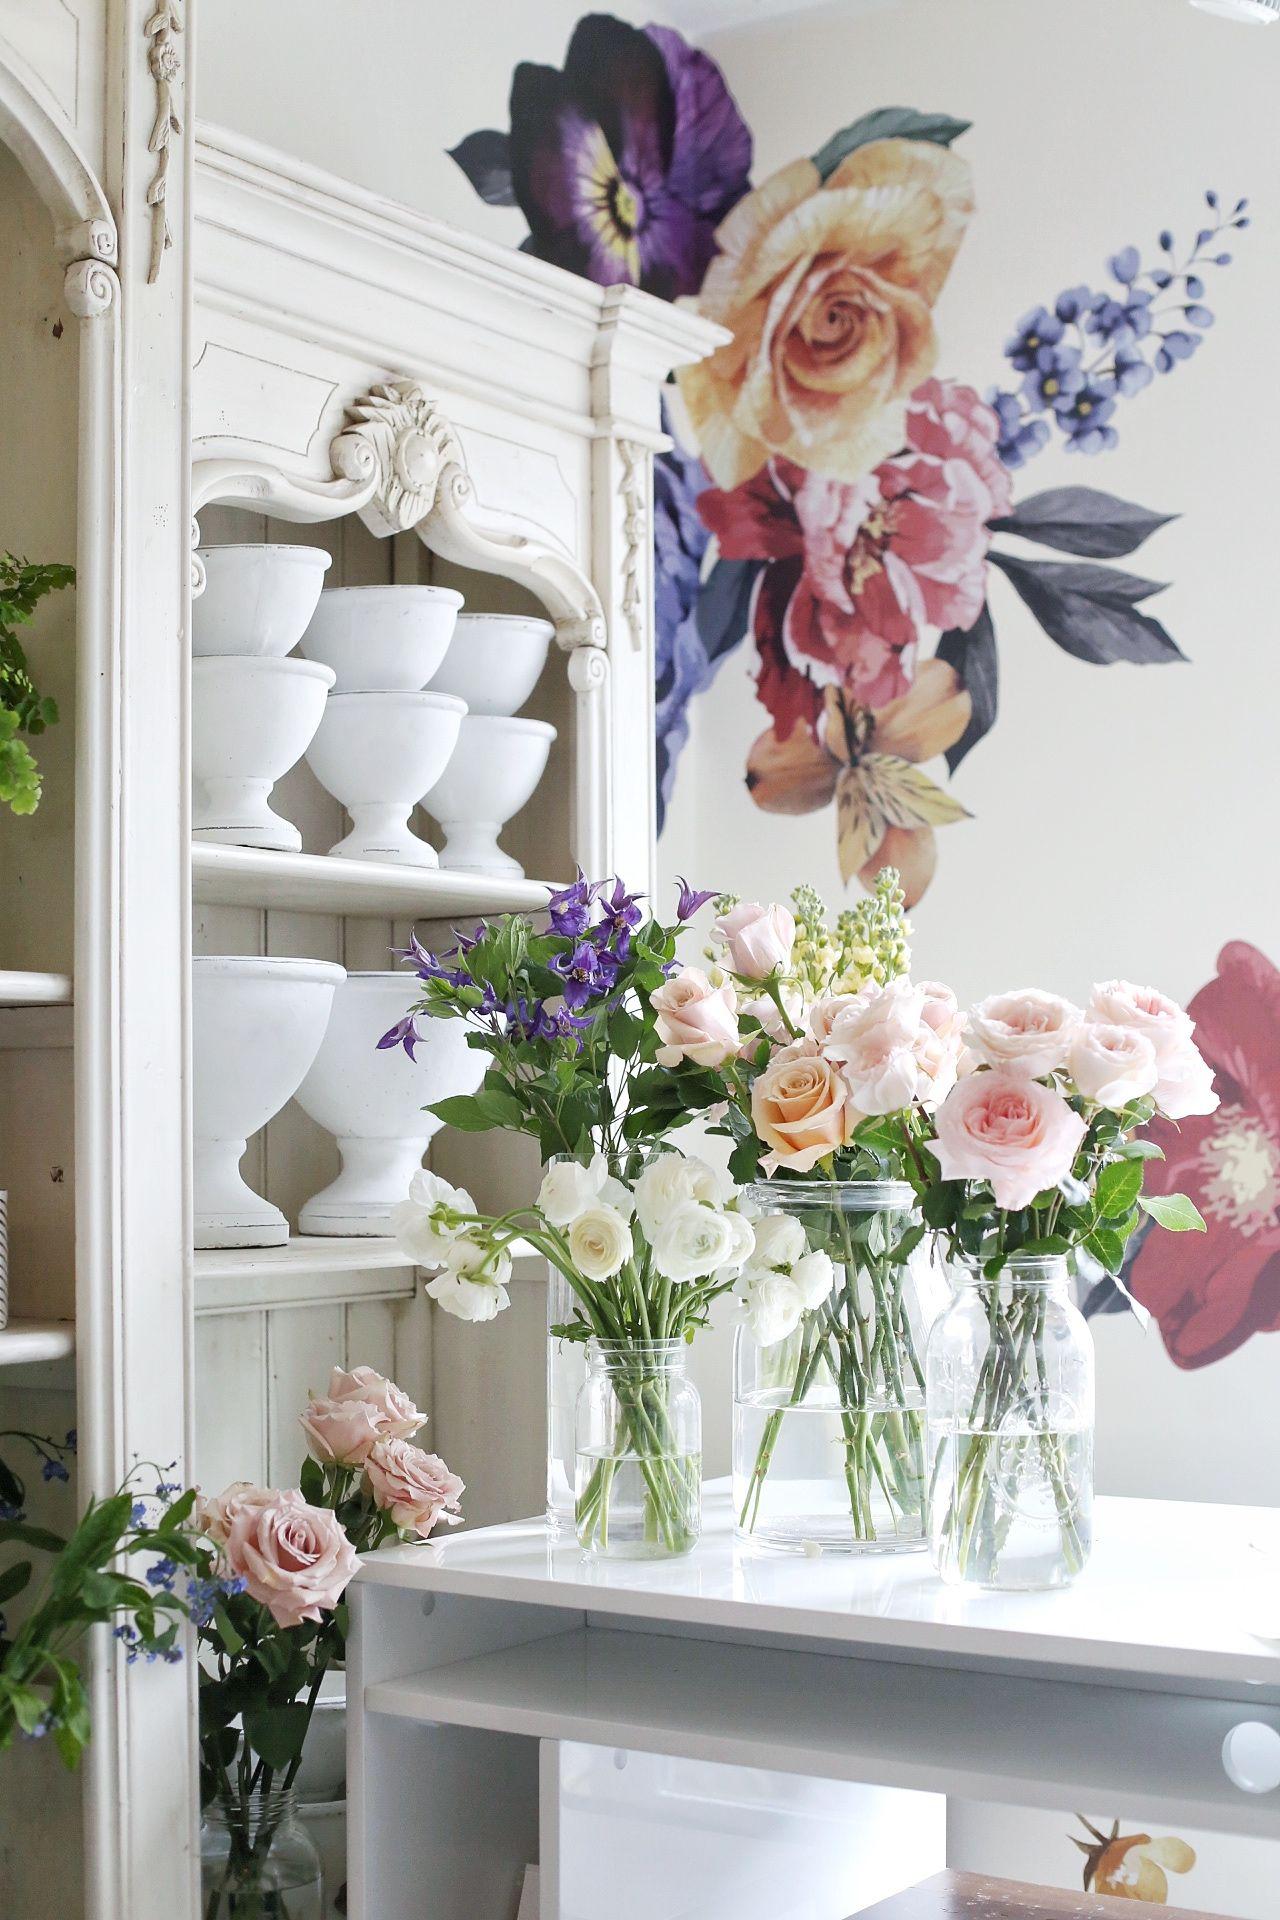 vintage floral wall decals urban walls - HD1280×1920